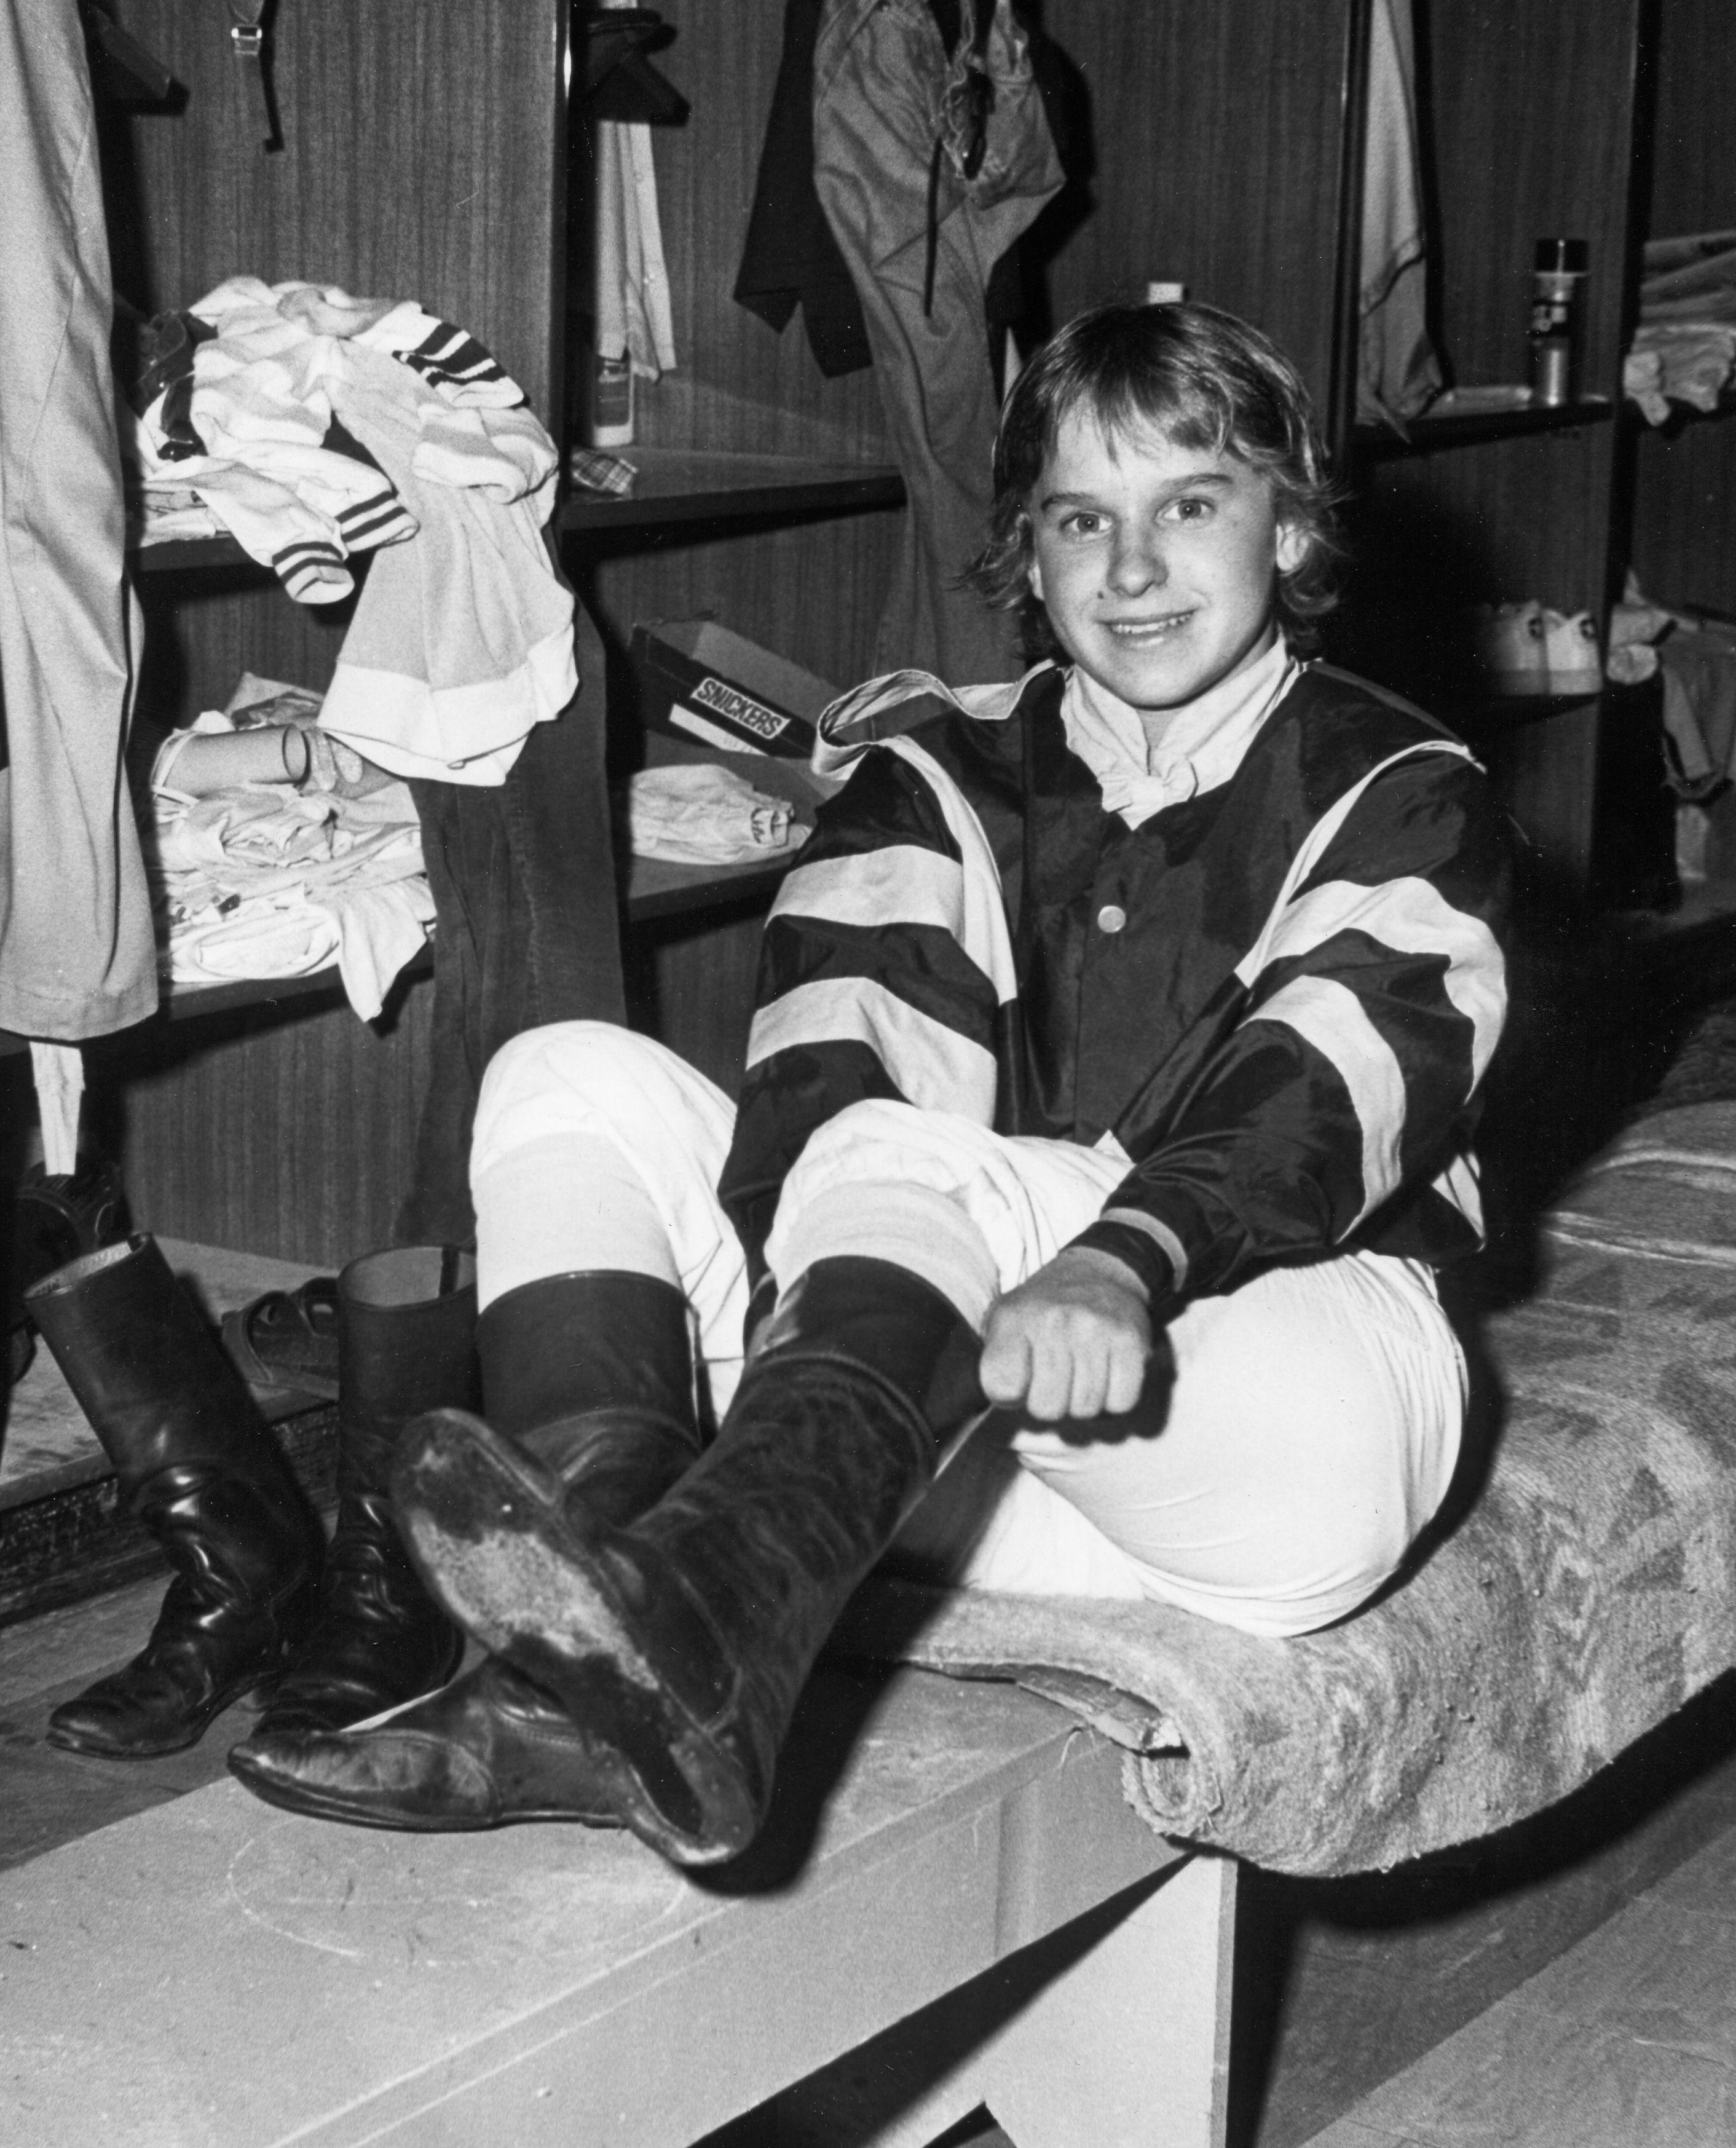 Julie Krone at Pimlico, 1981 (Maryland Jockey Club)